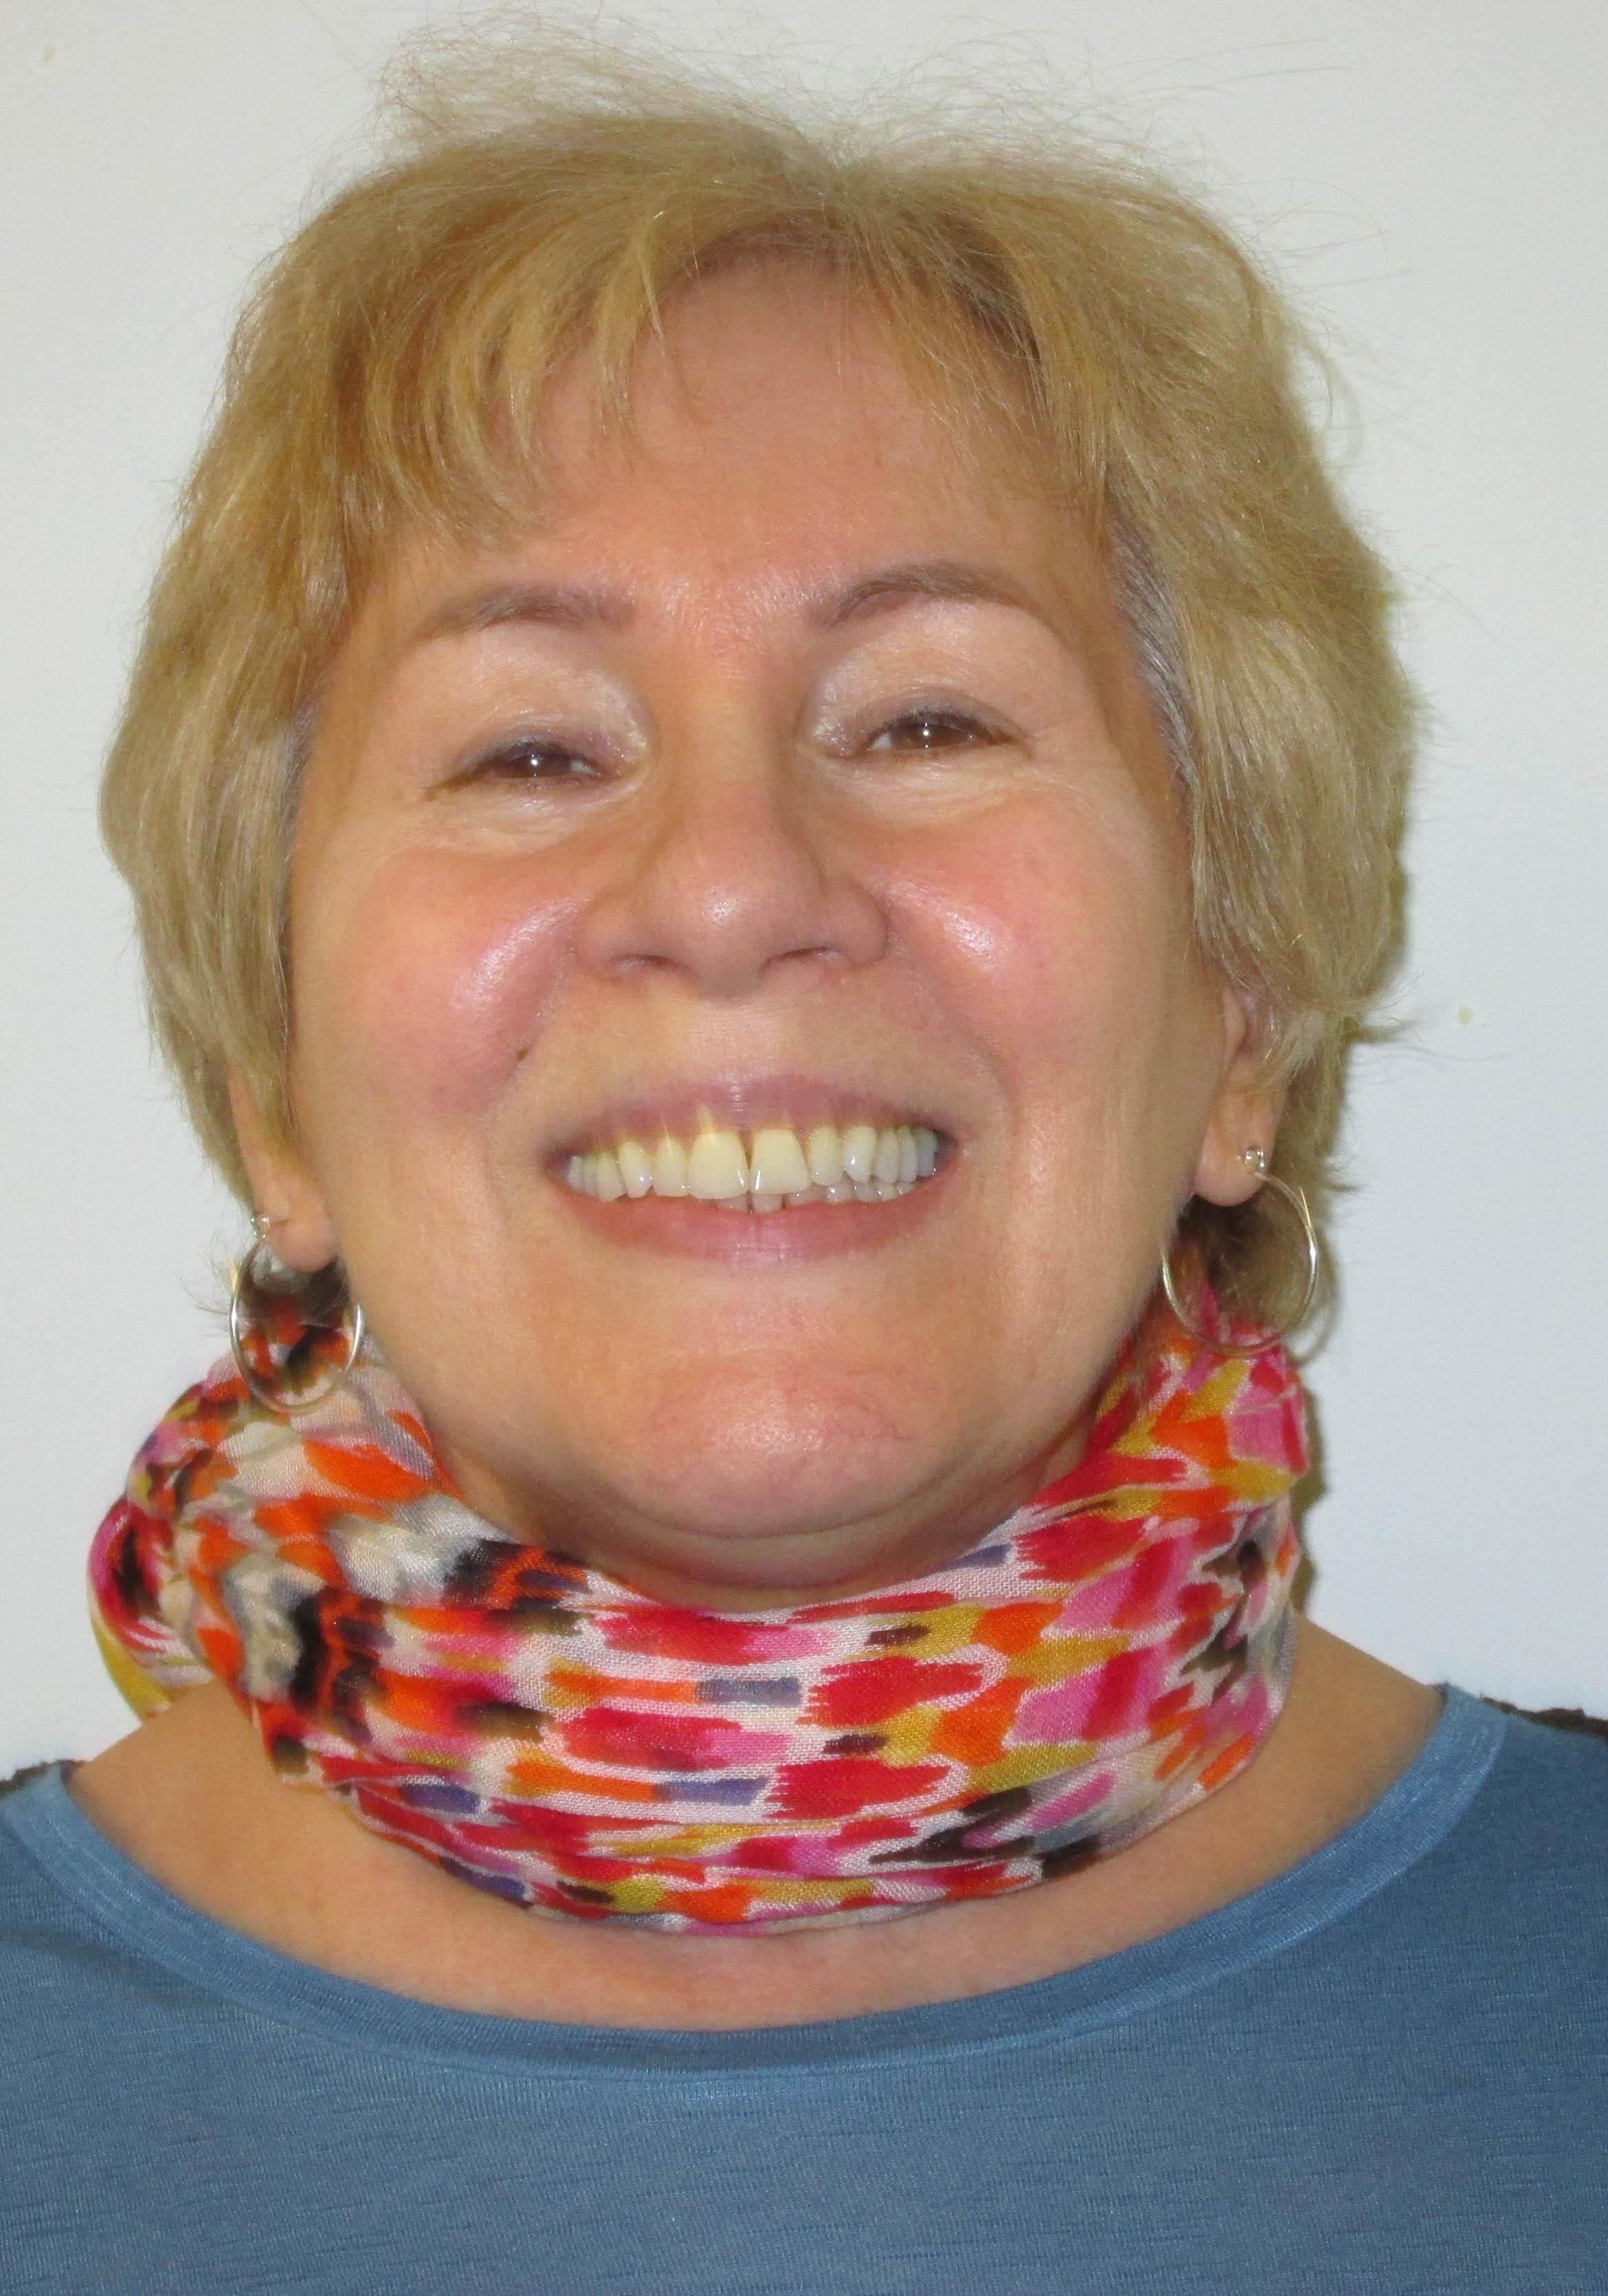 Joan Wattimo, L.A.D.C.I Clinician